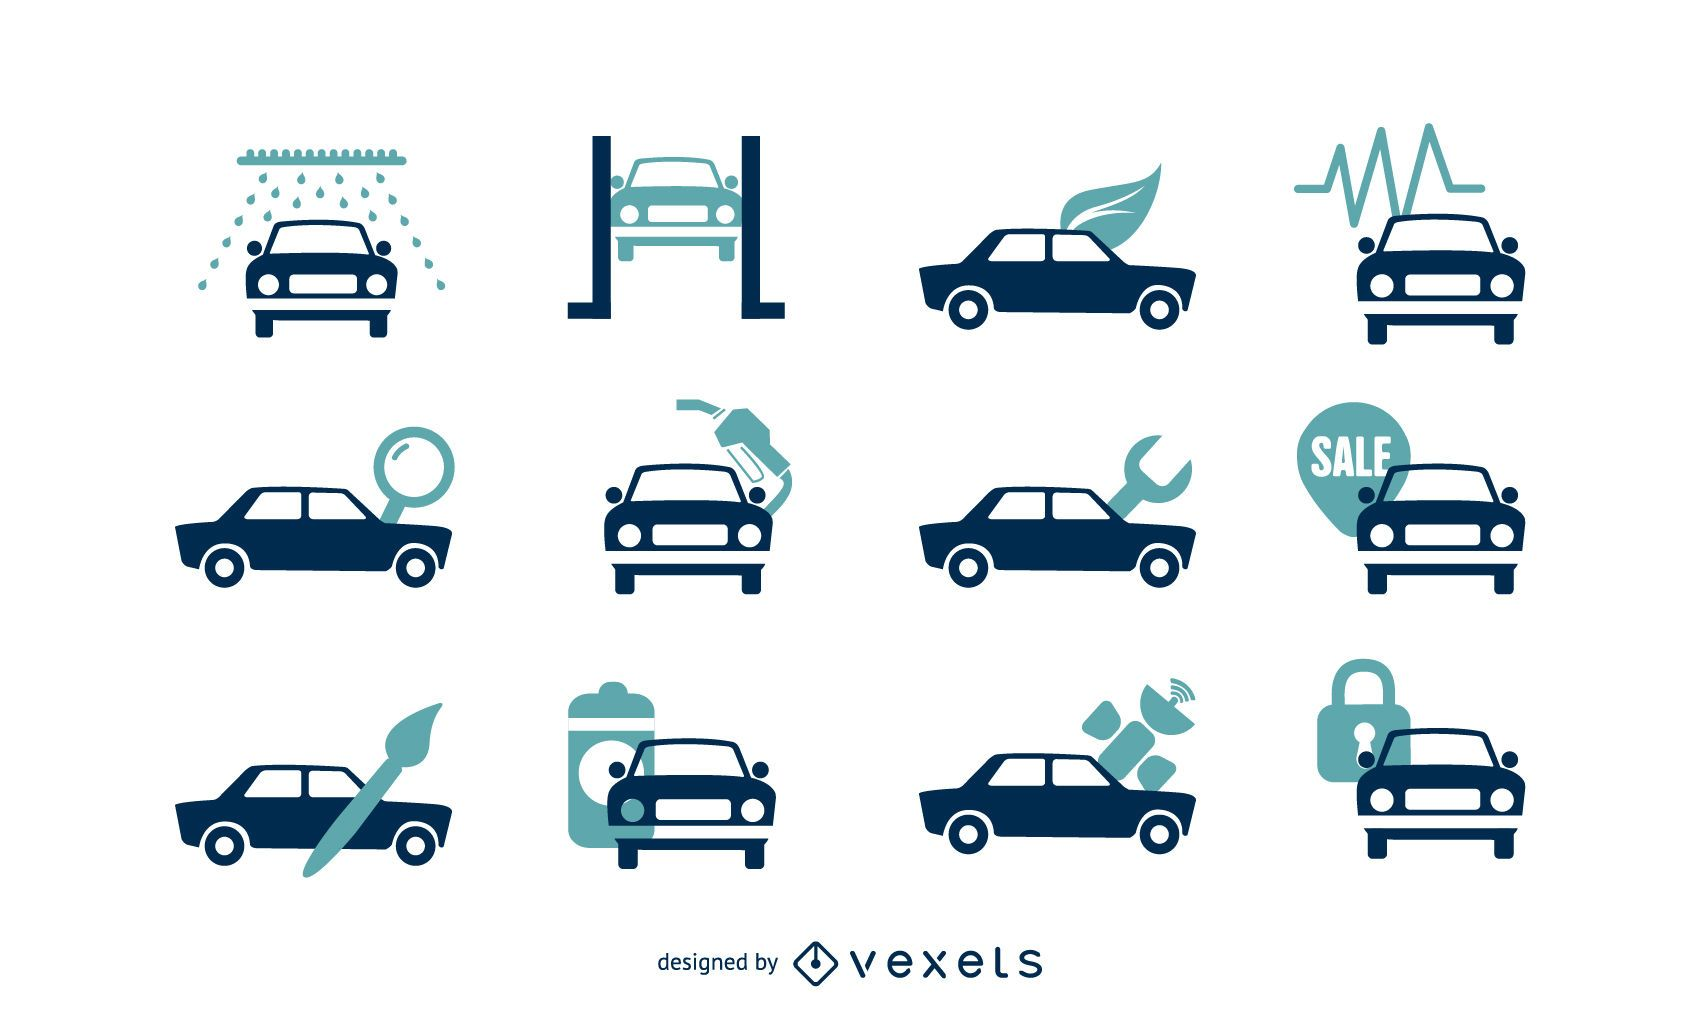 Car Services Vector Icons